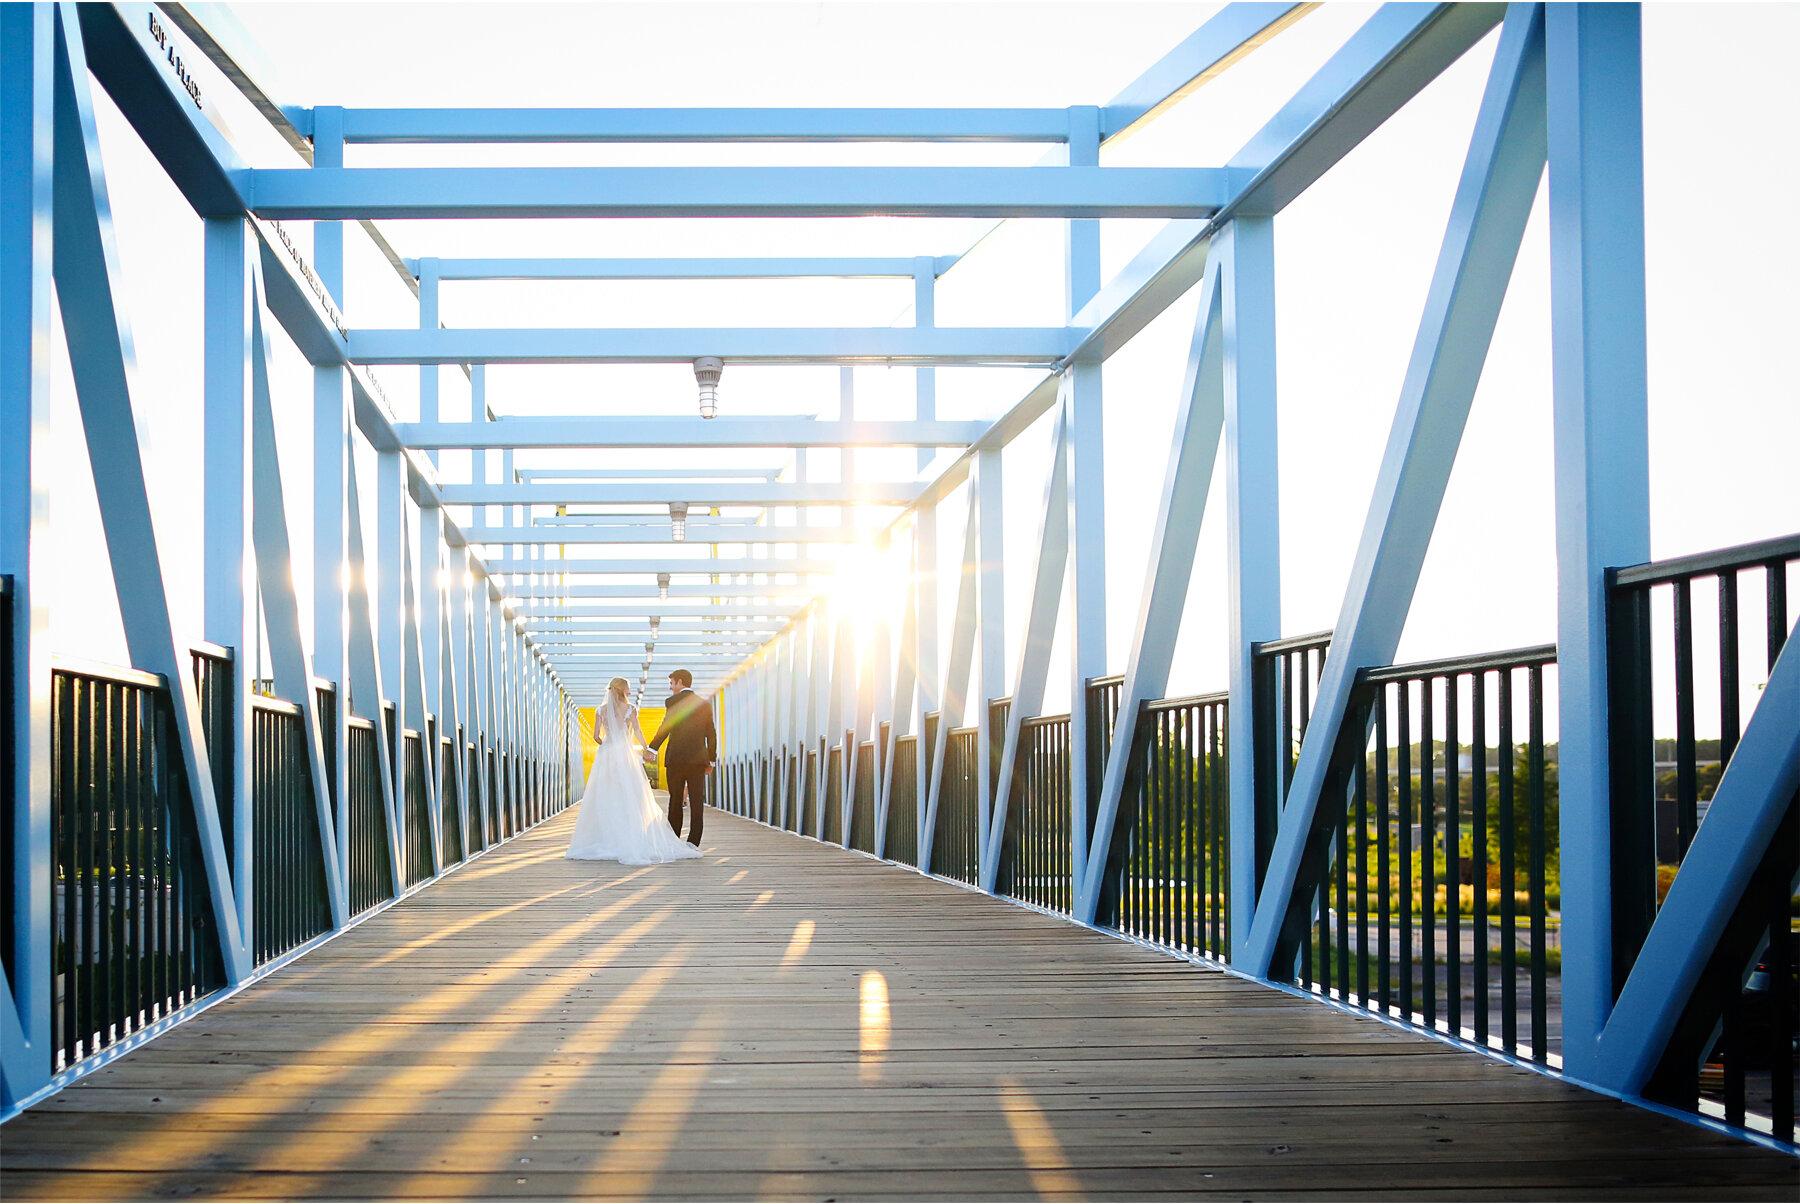 18 Wedding Vick Photography Minneapolis Minnesota Bride Groom Blue Bridge Sunset Michelle and William.jpg